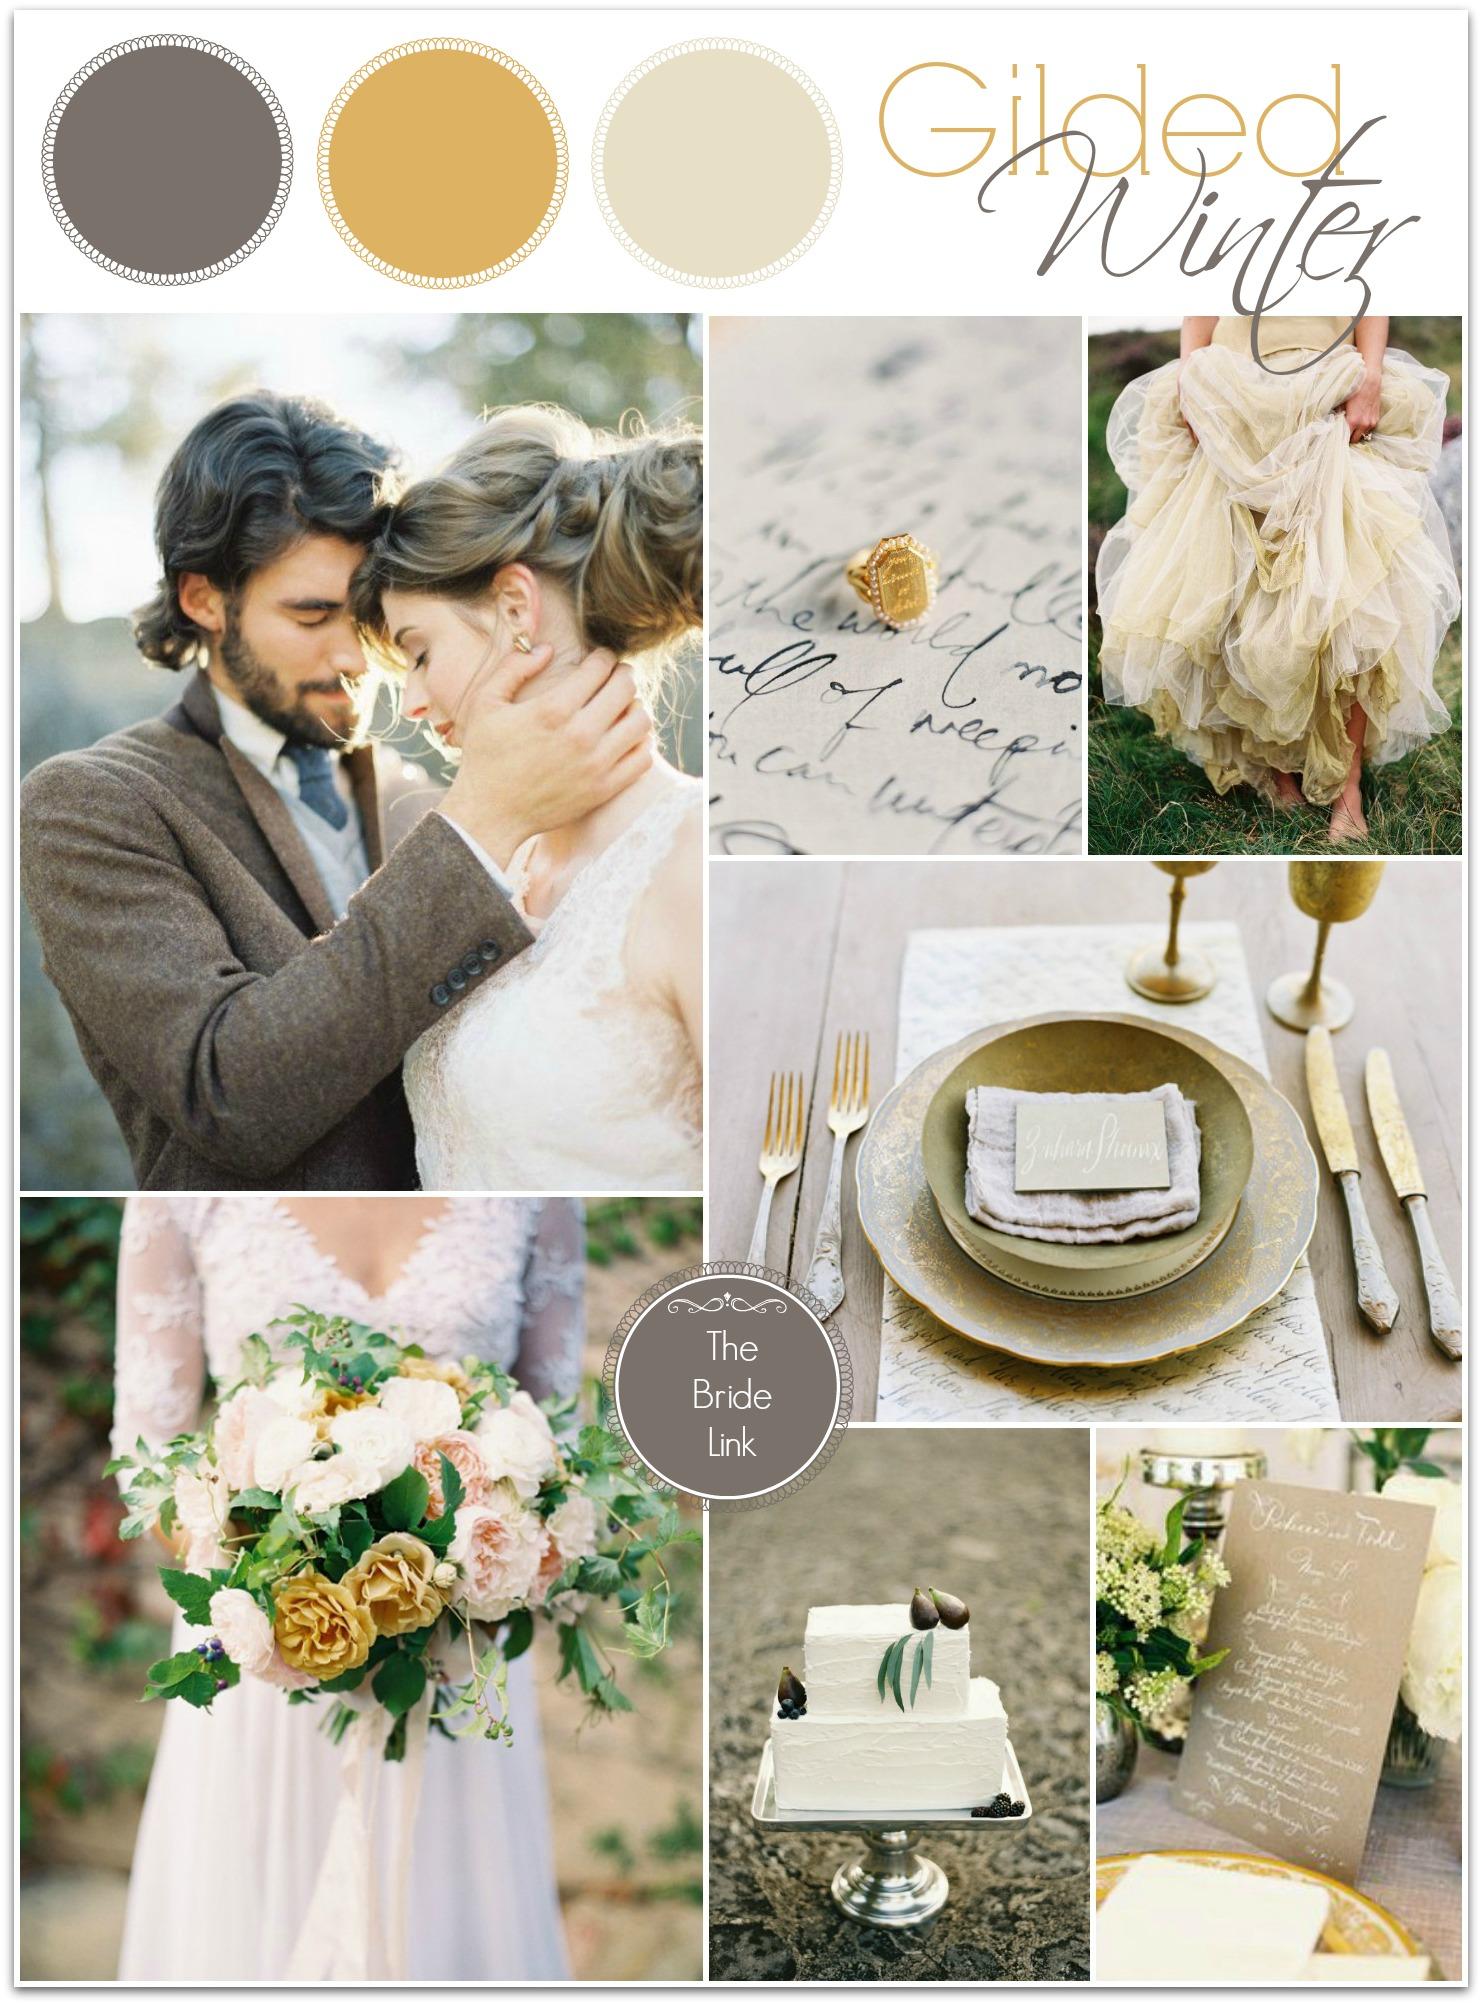 guilded winter wedding